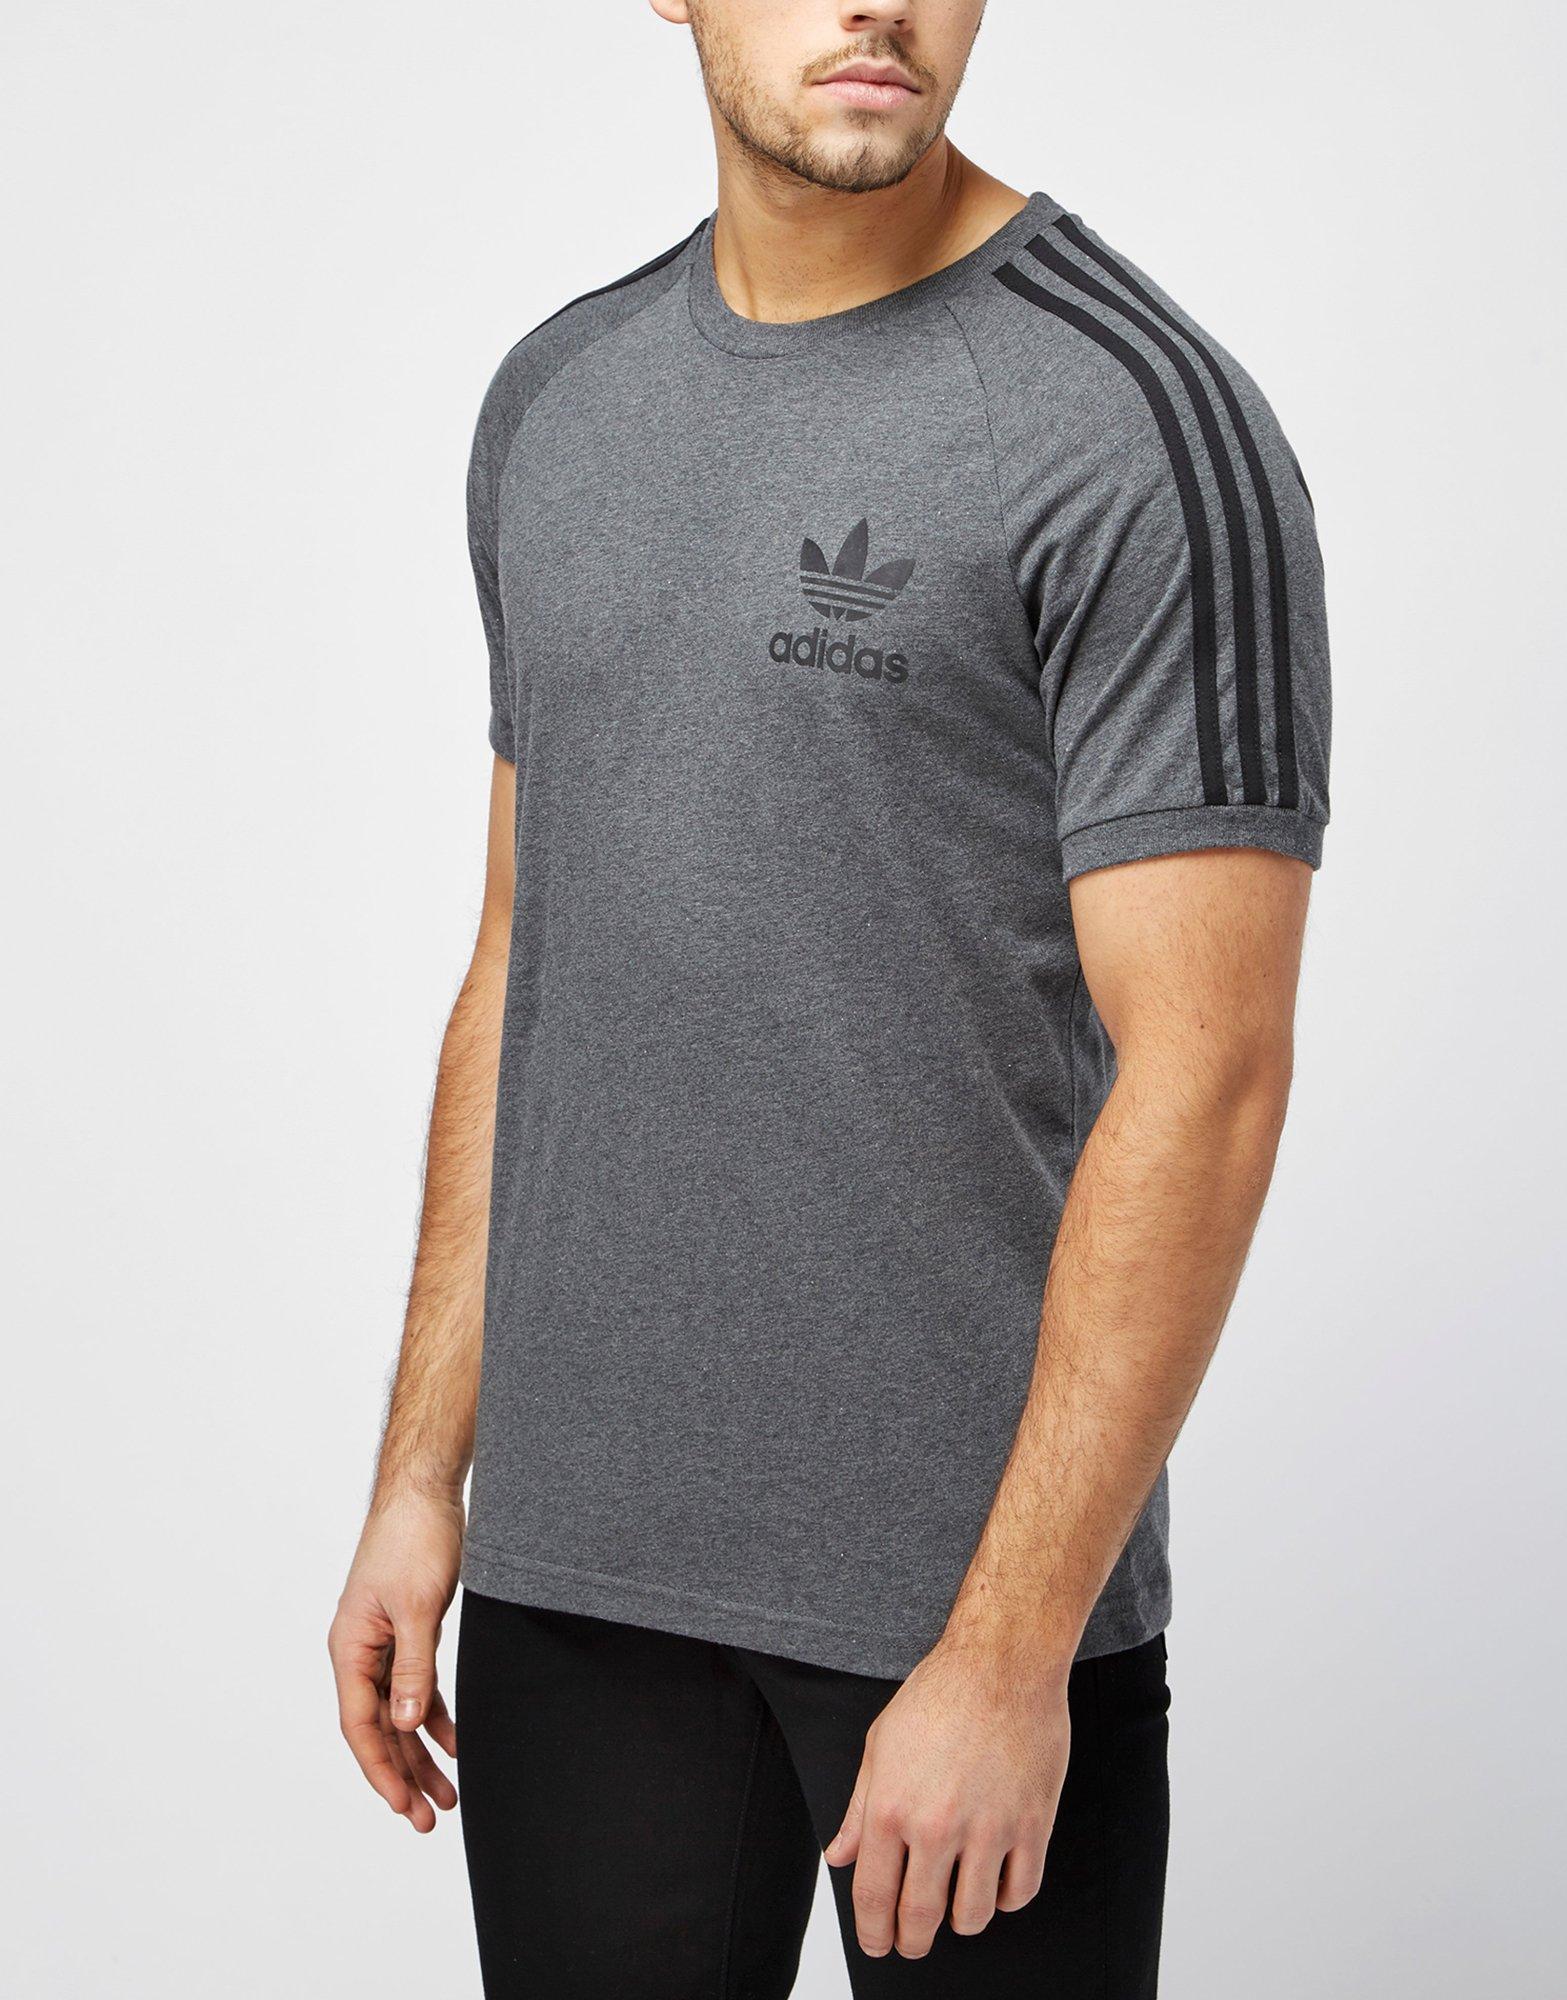 adidas originals california t shirt grey